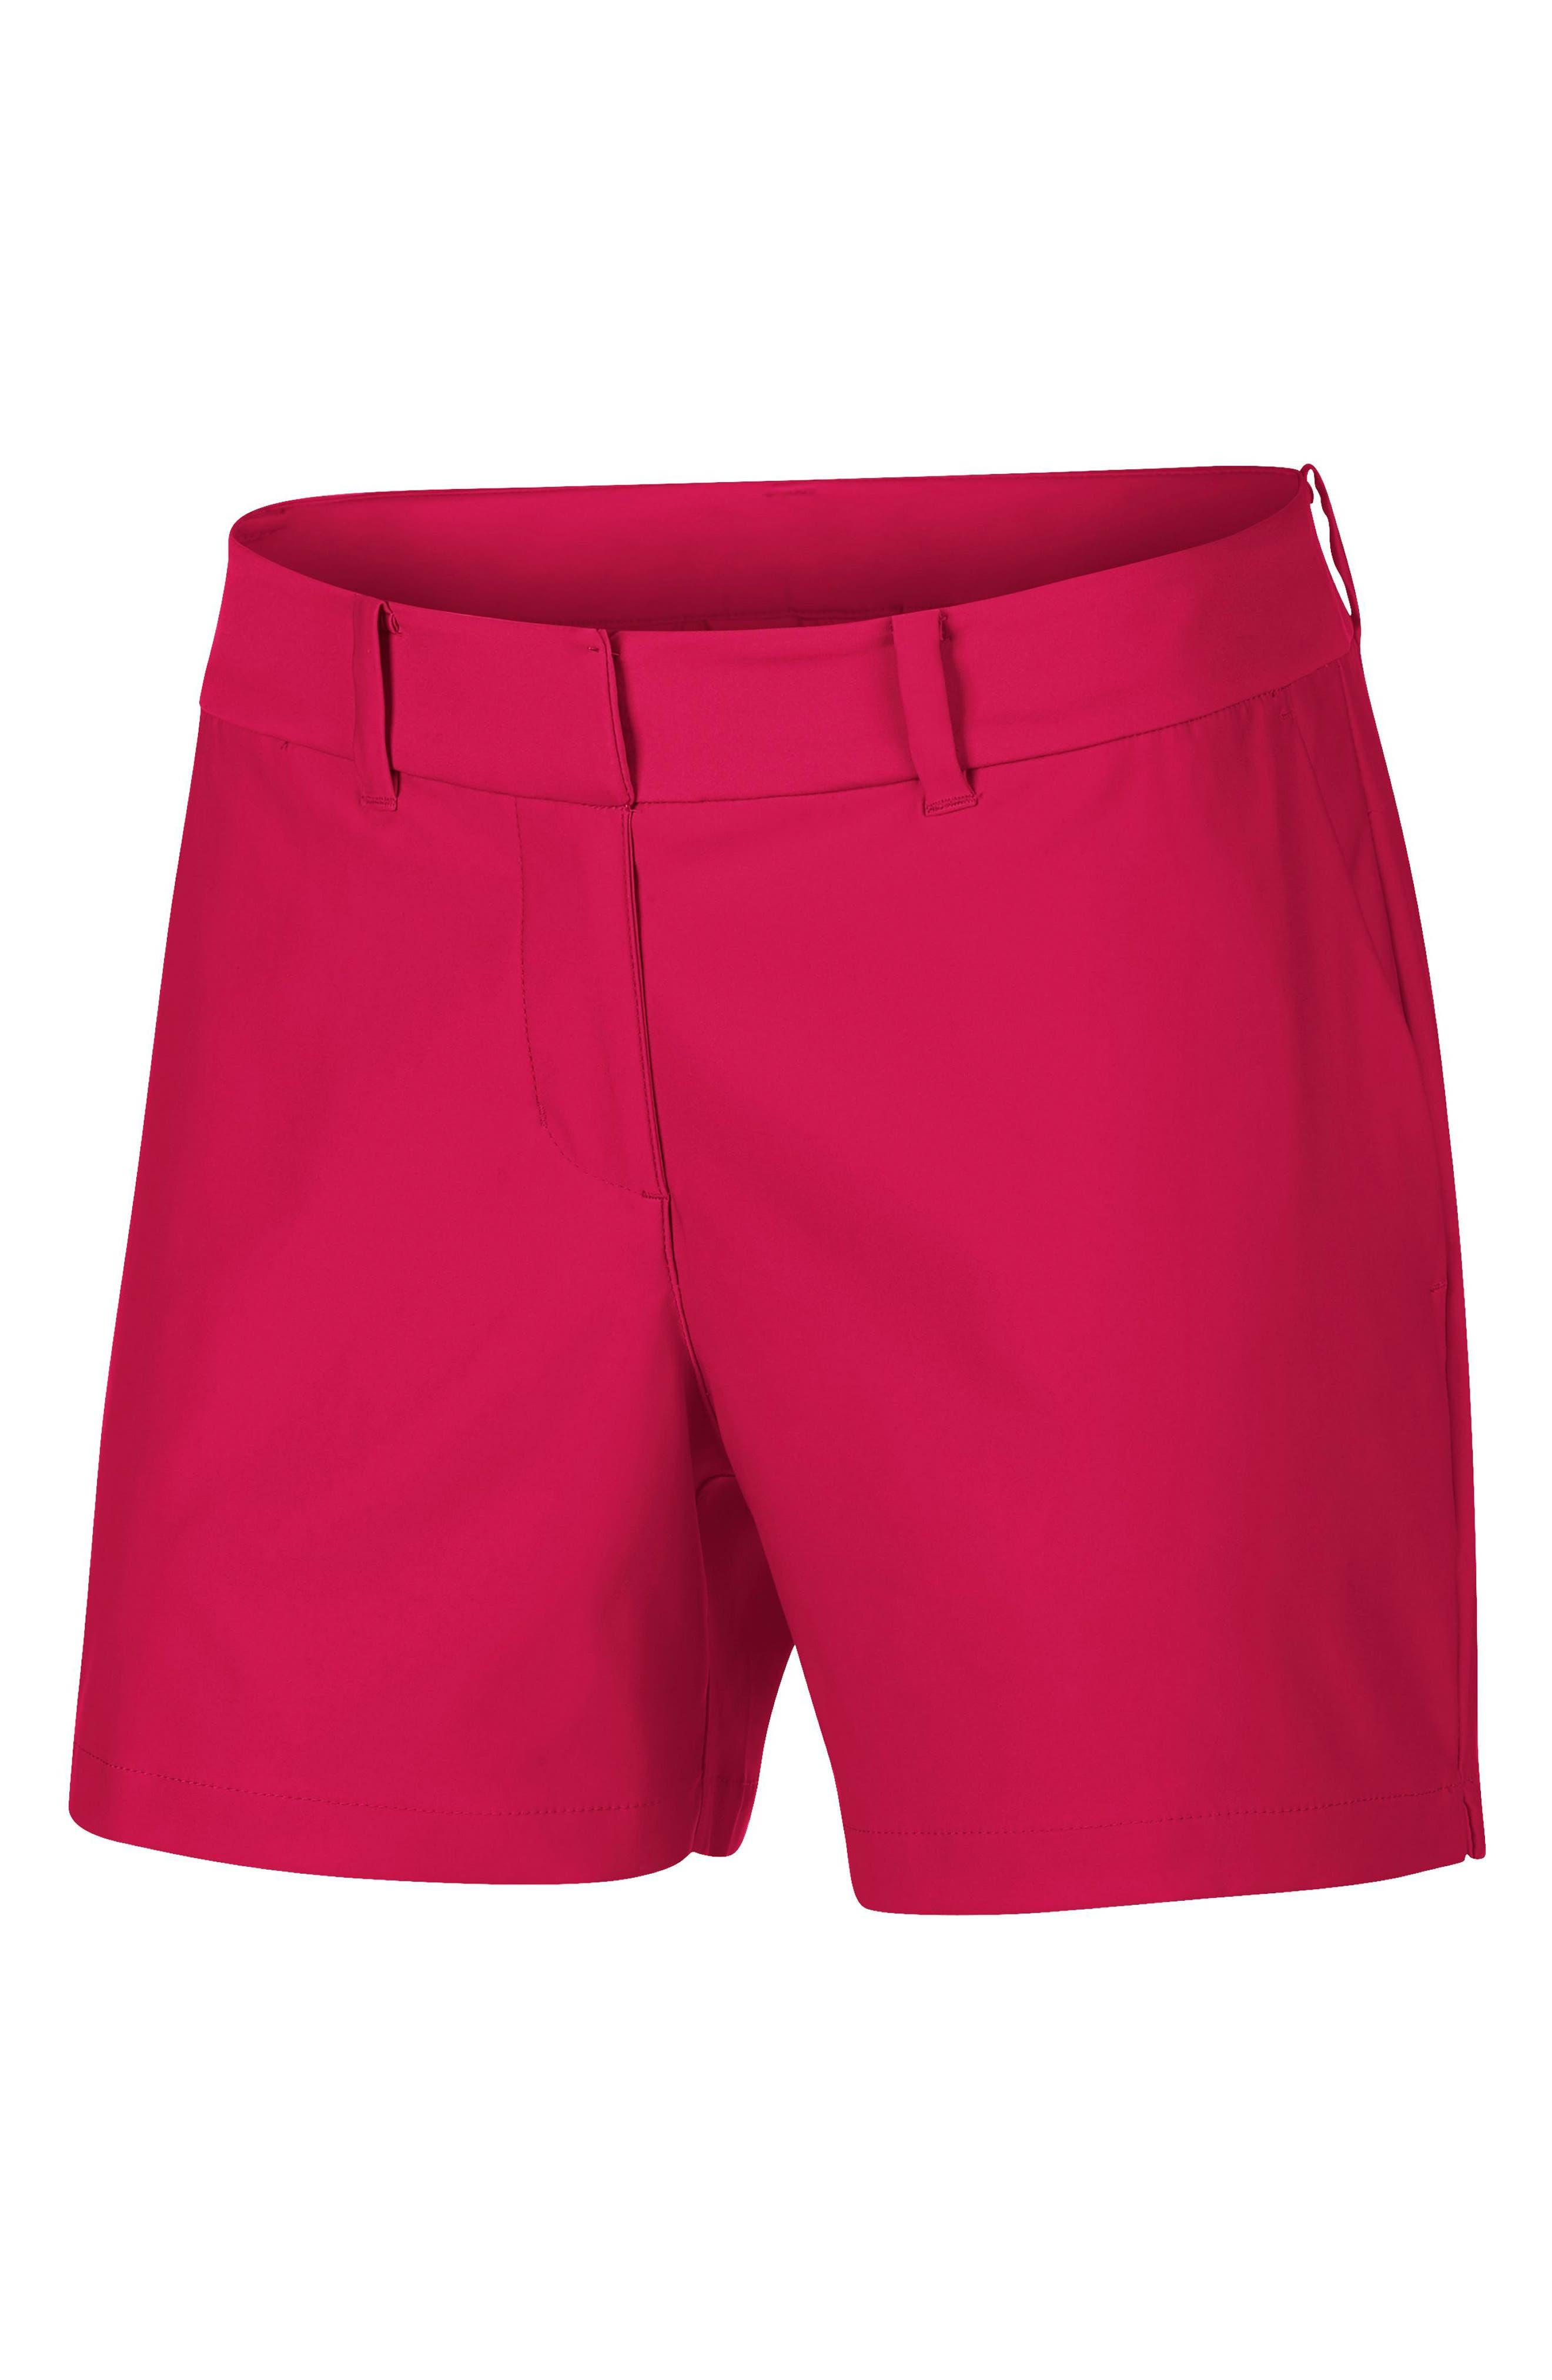 Flex Golf Shorts,                         Main,                         color, RUSH PINK/ RUSH PINK